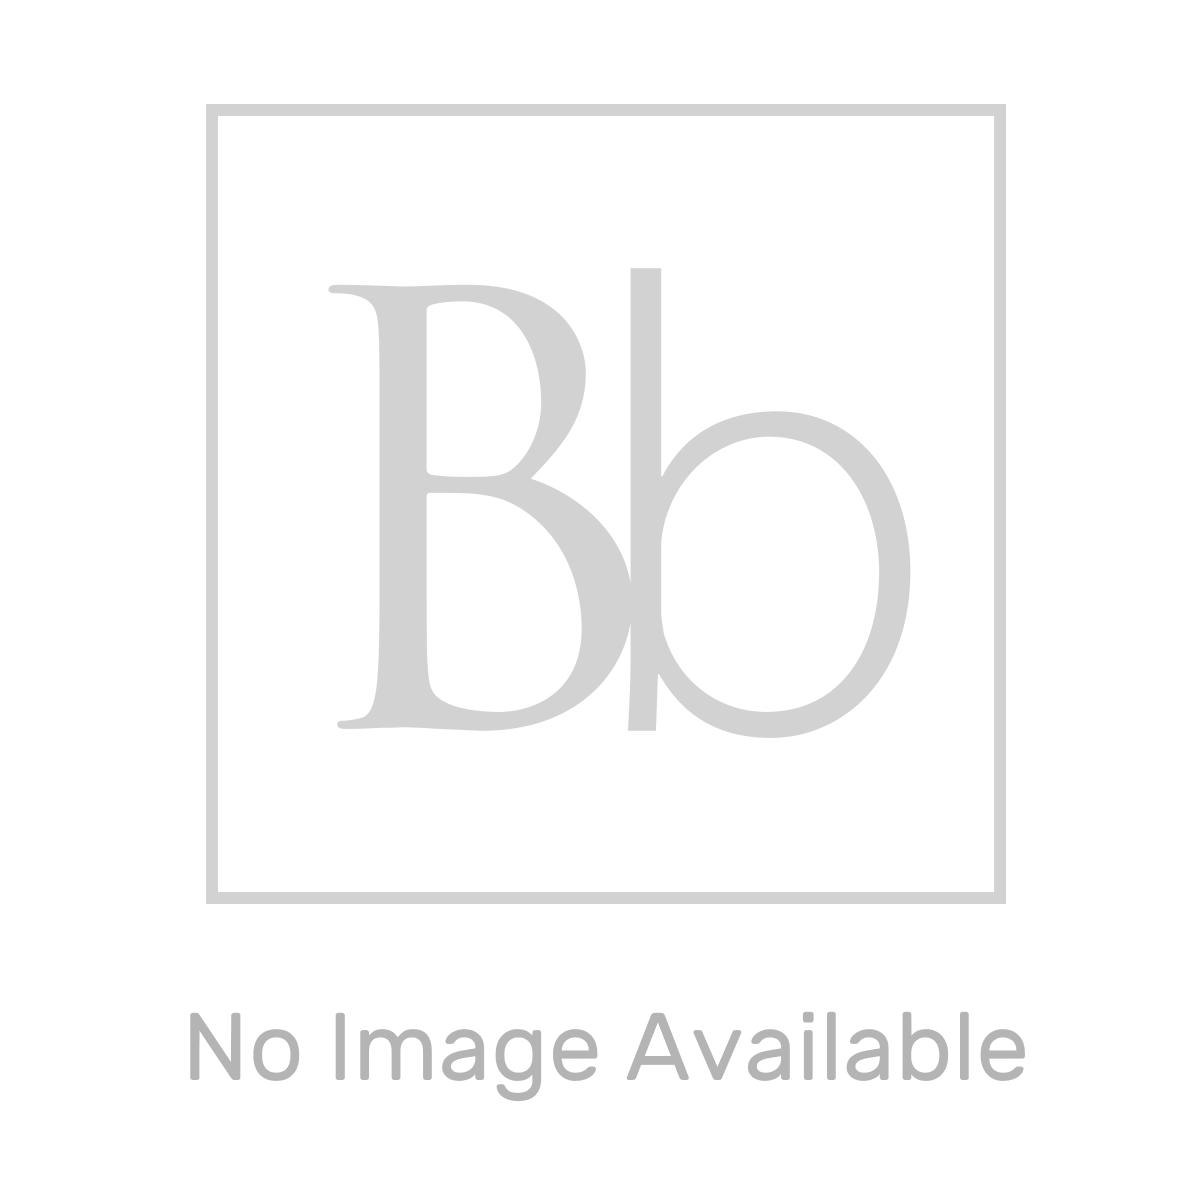 Frontline Onix Gloss White Tall Wall Unit